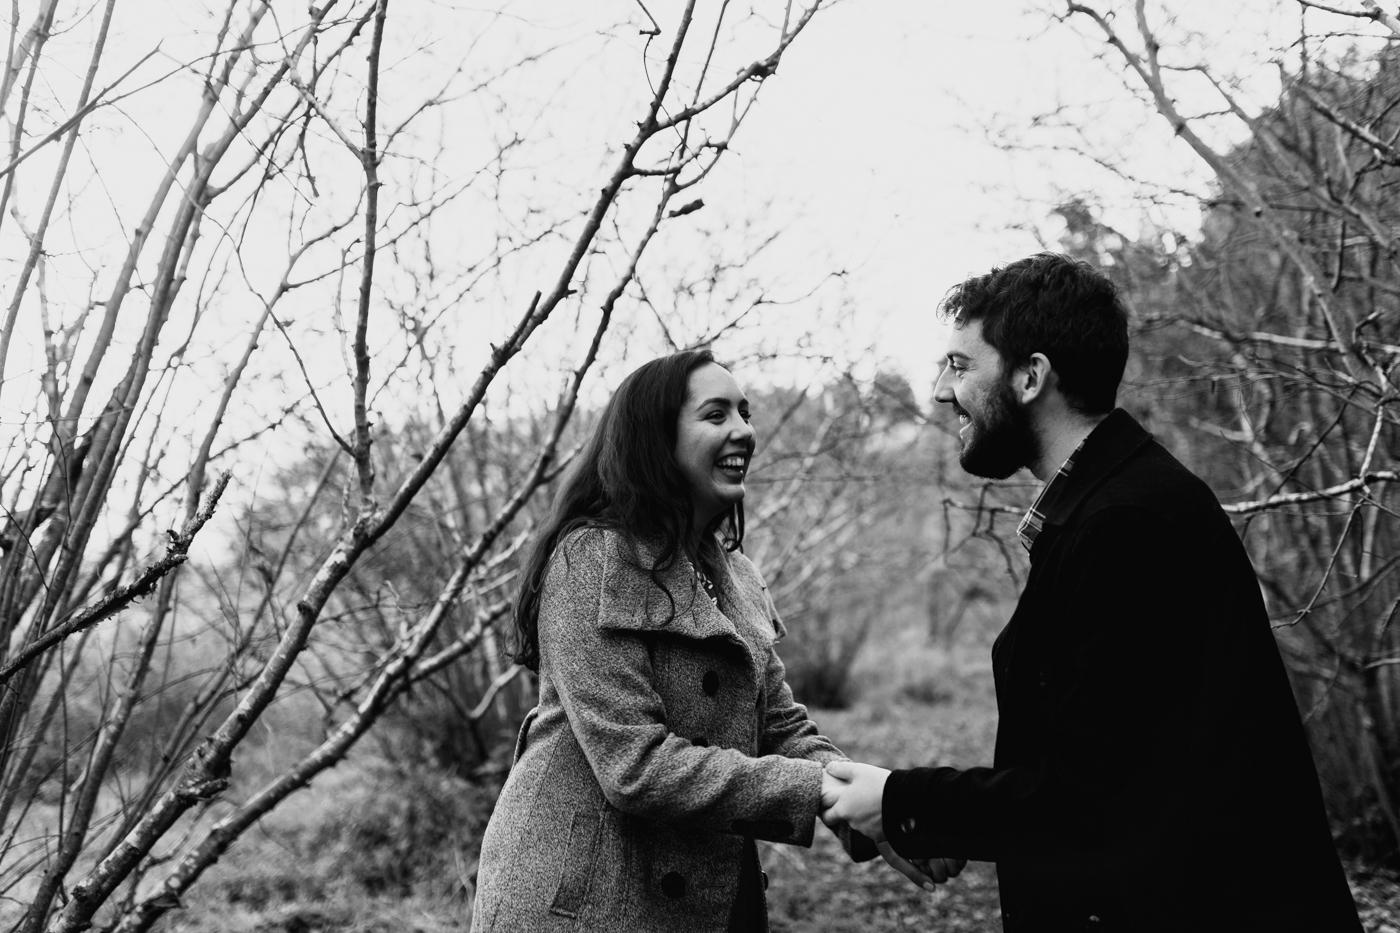 Kate & Kieran - Southern Highlands Engagement - Samantha Heather Photography-36.jpg